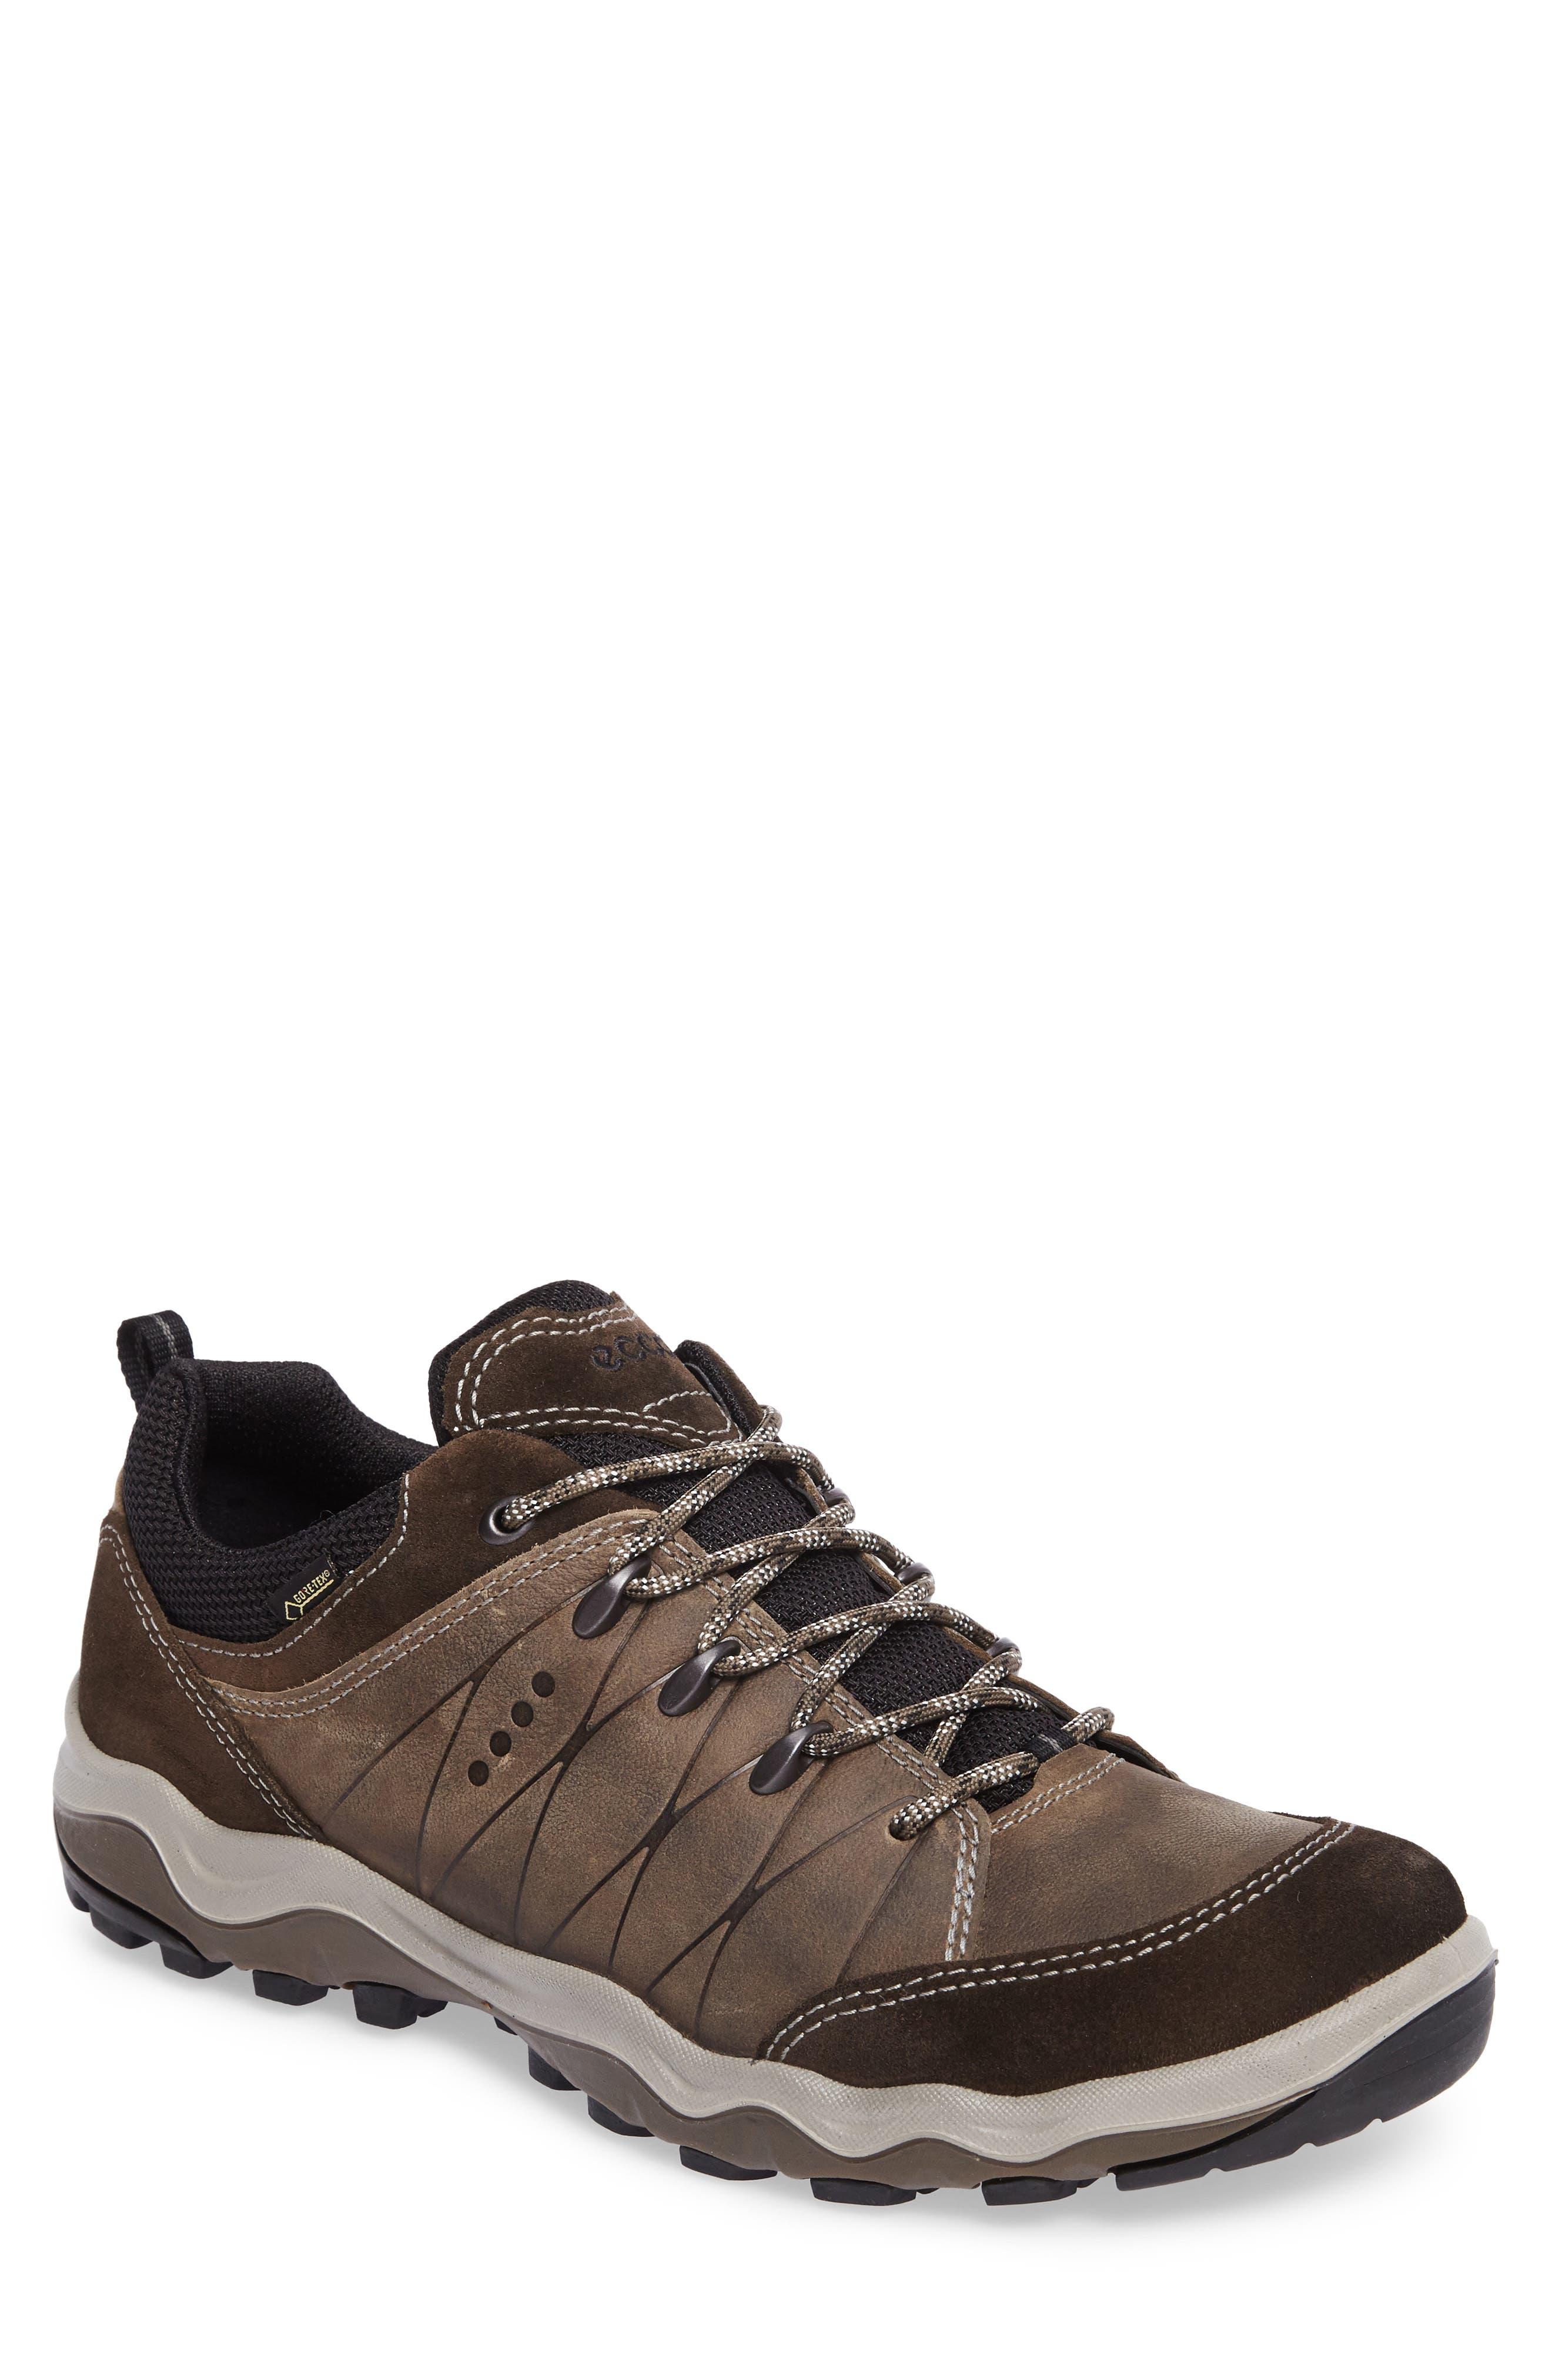 Ulterra GTX Sneaker,                             Main thumbnail 1, color,                             Tarmac Suede